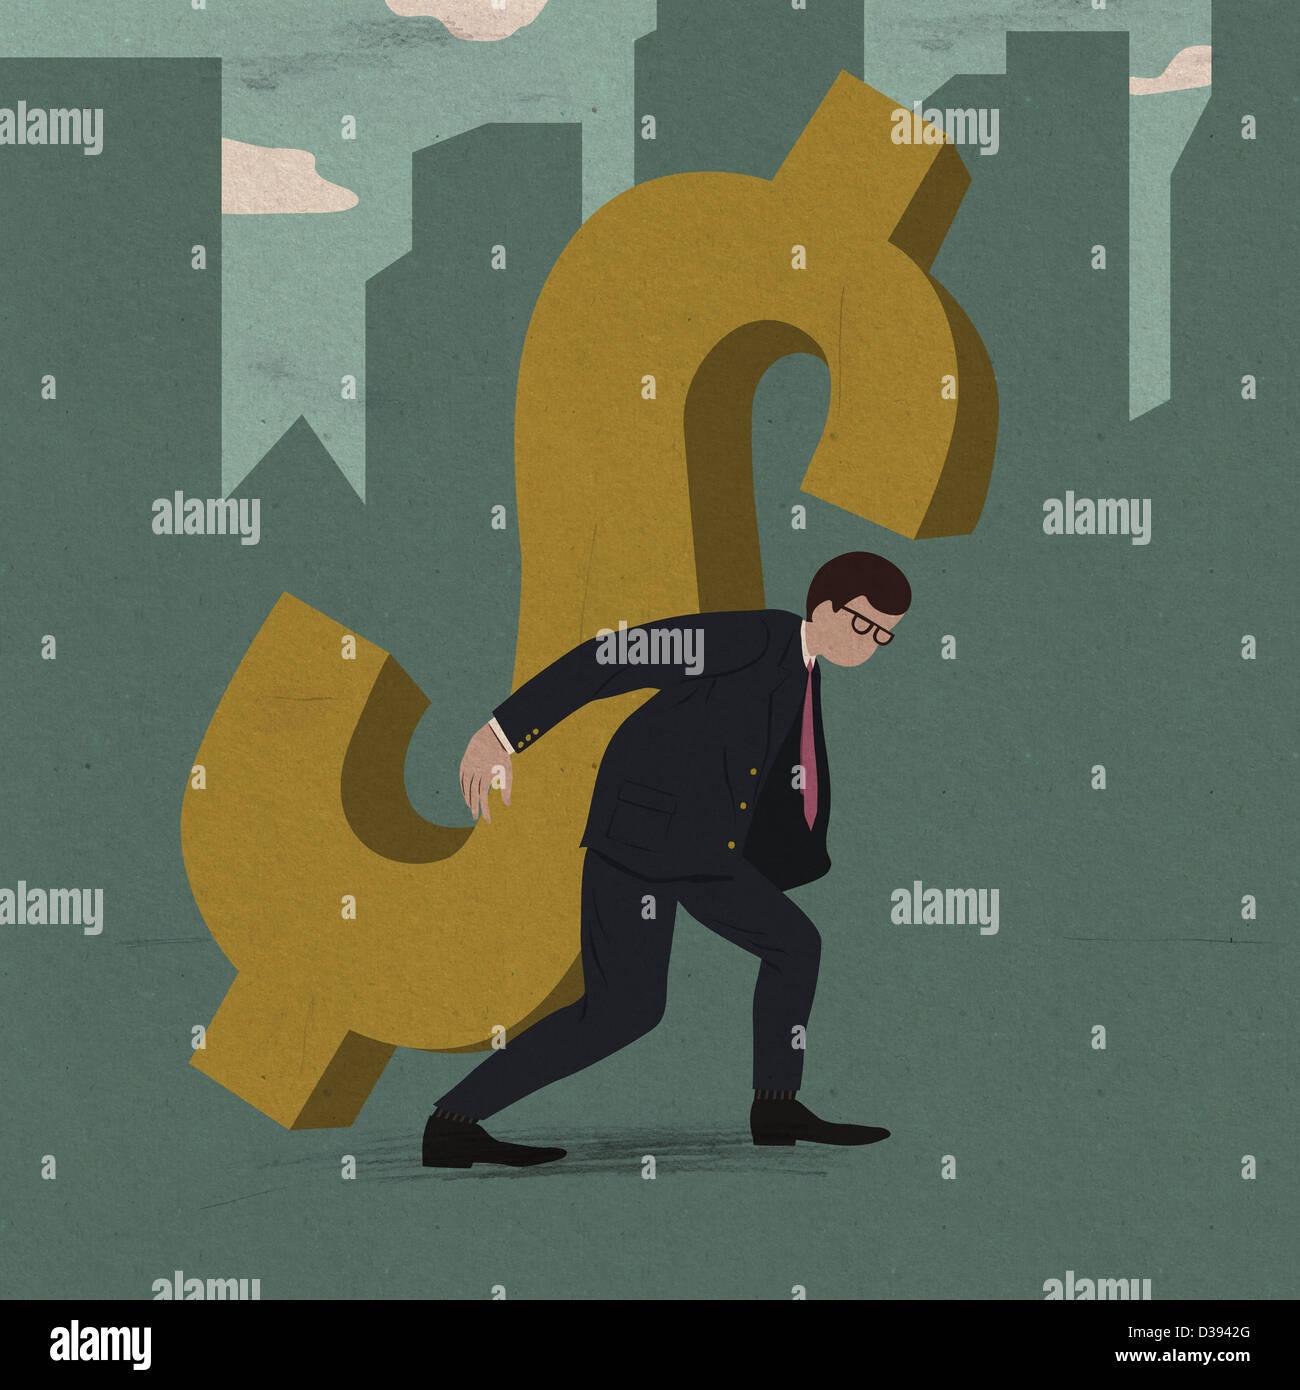 Businessman carrying the burden of business debt Stock Photo